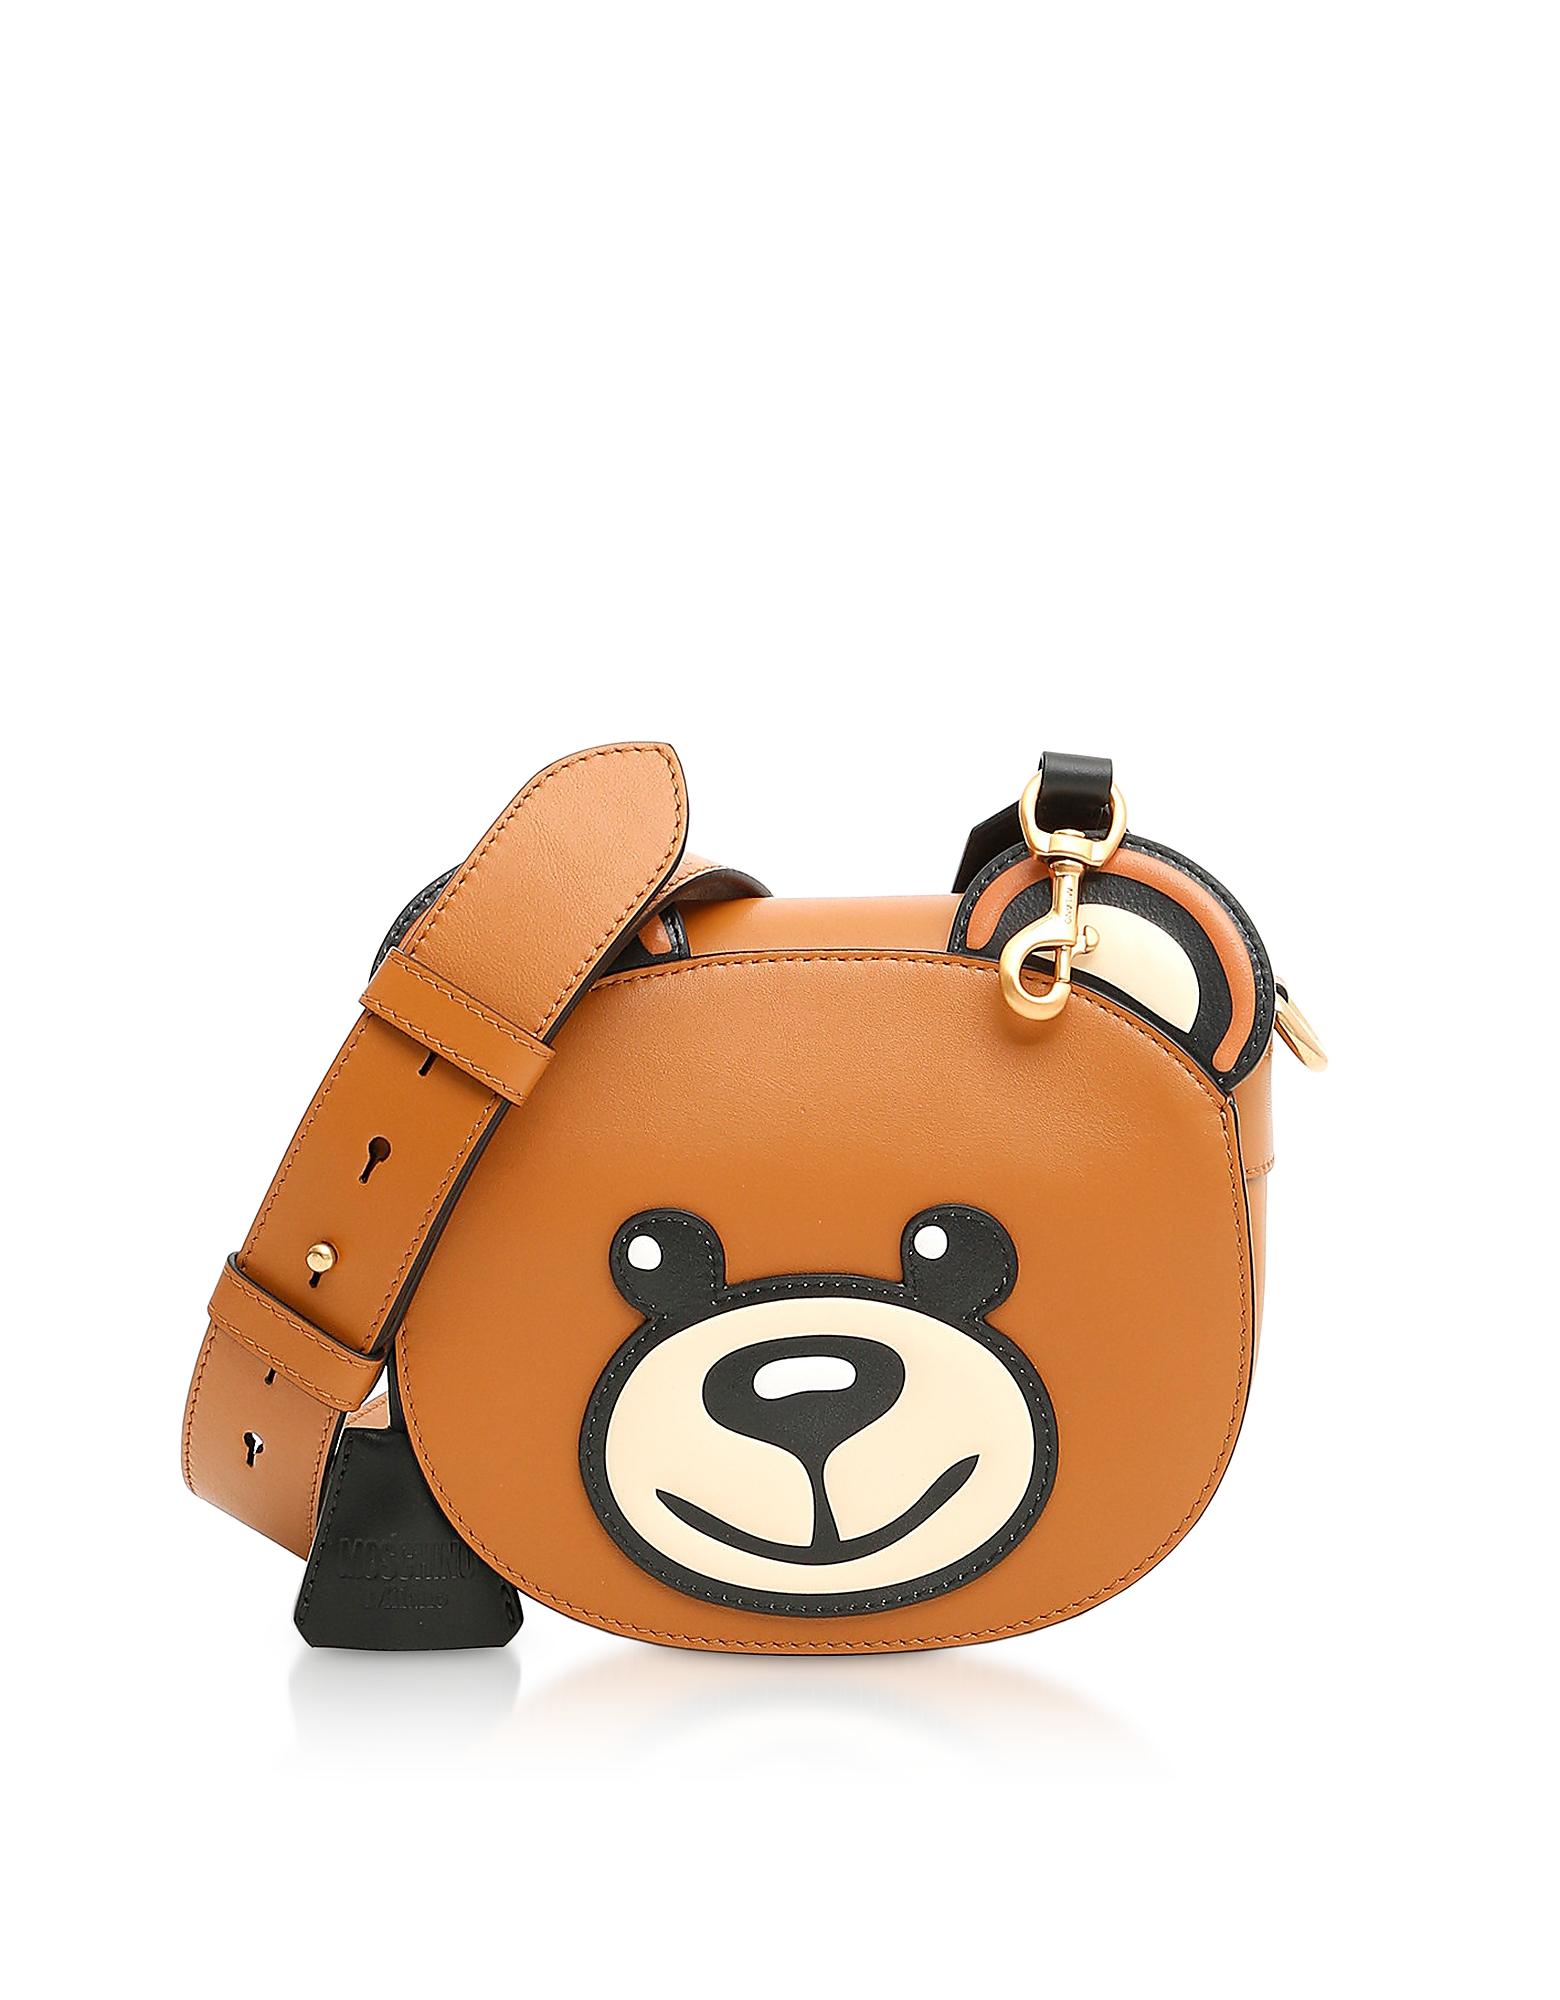 Moschino Handbags, Large Teddy Bear Leather Shoulder Bag